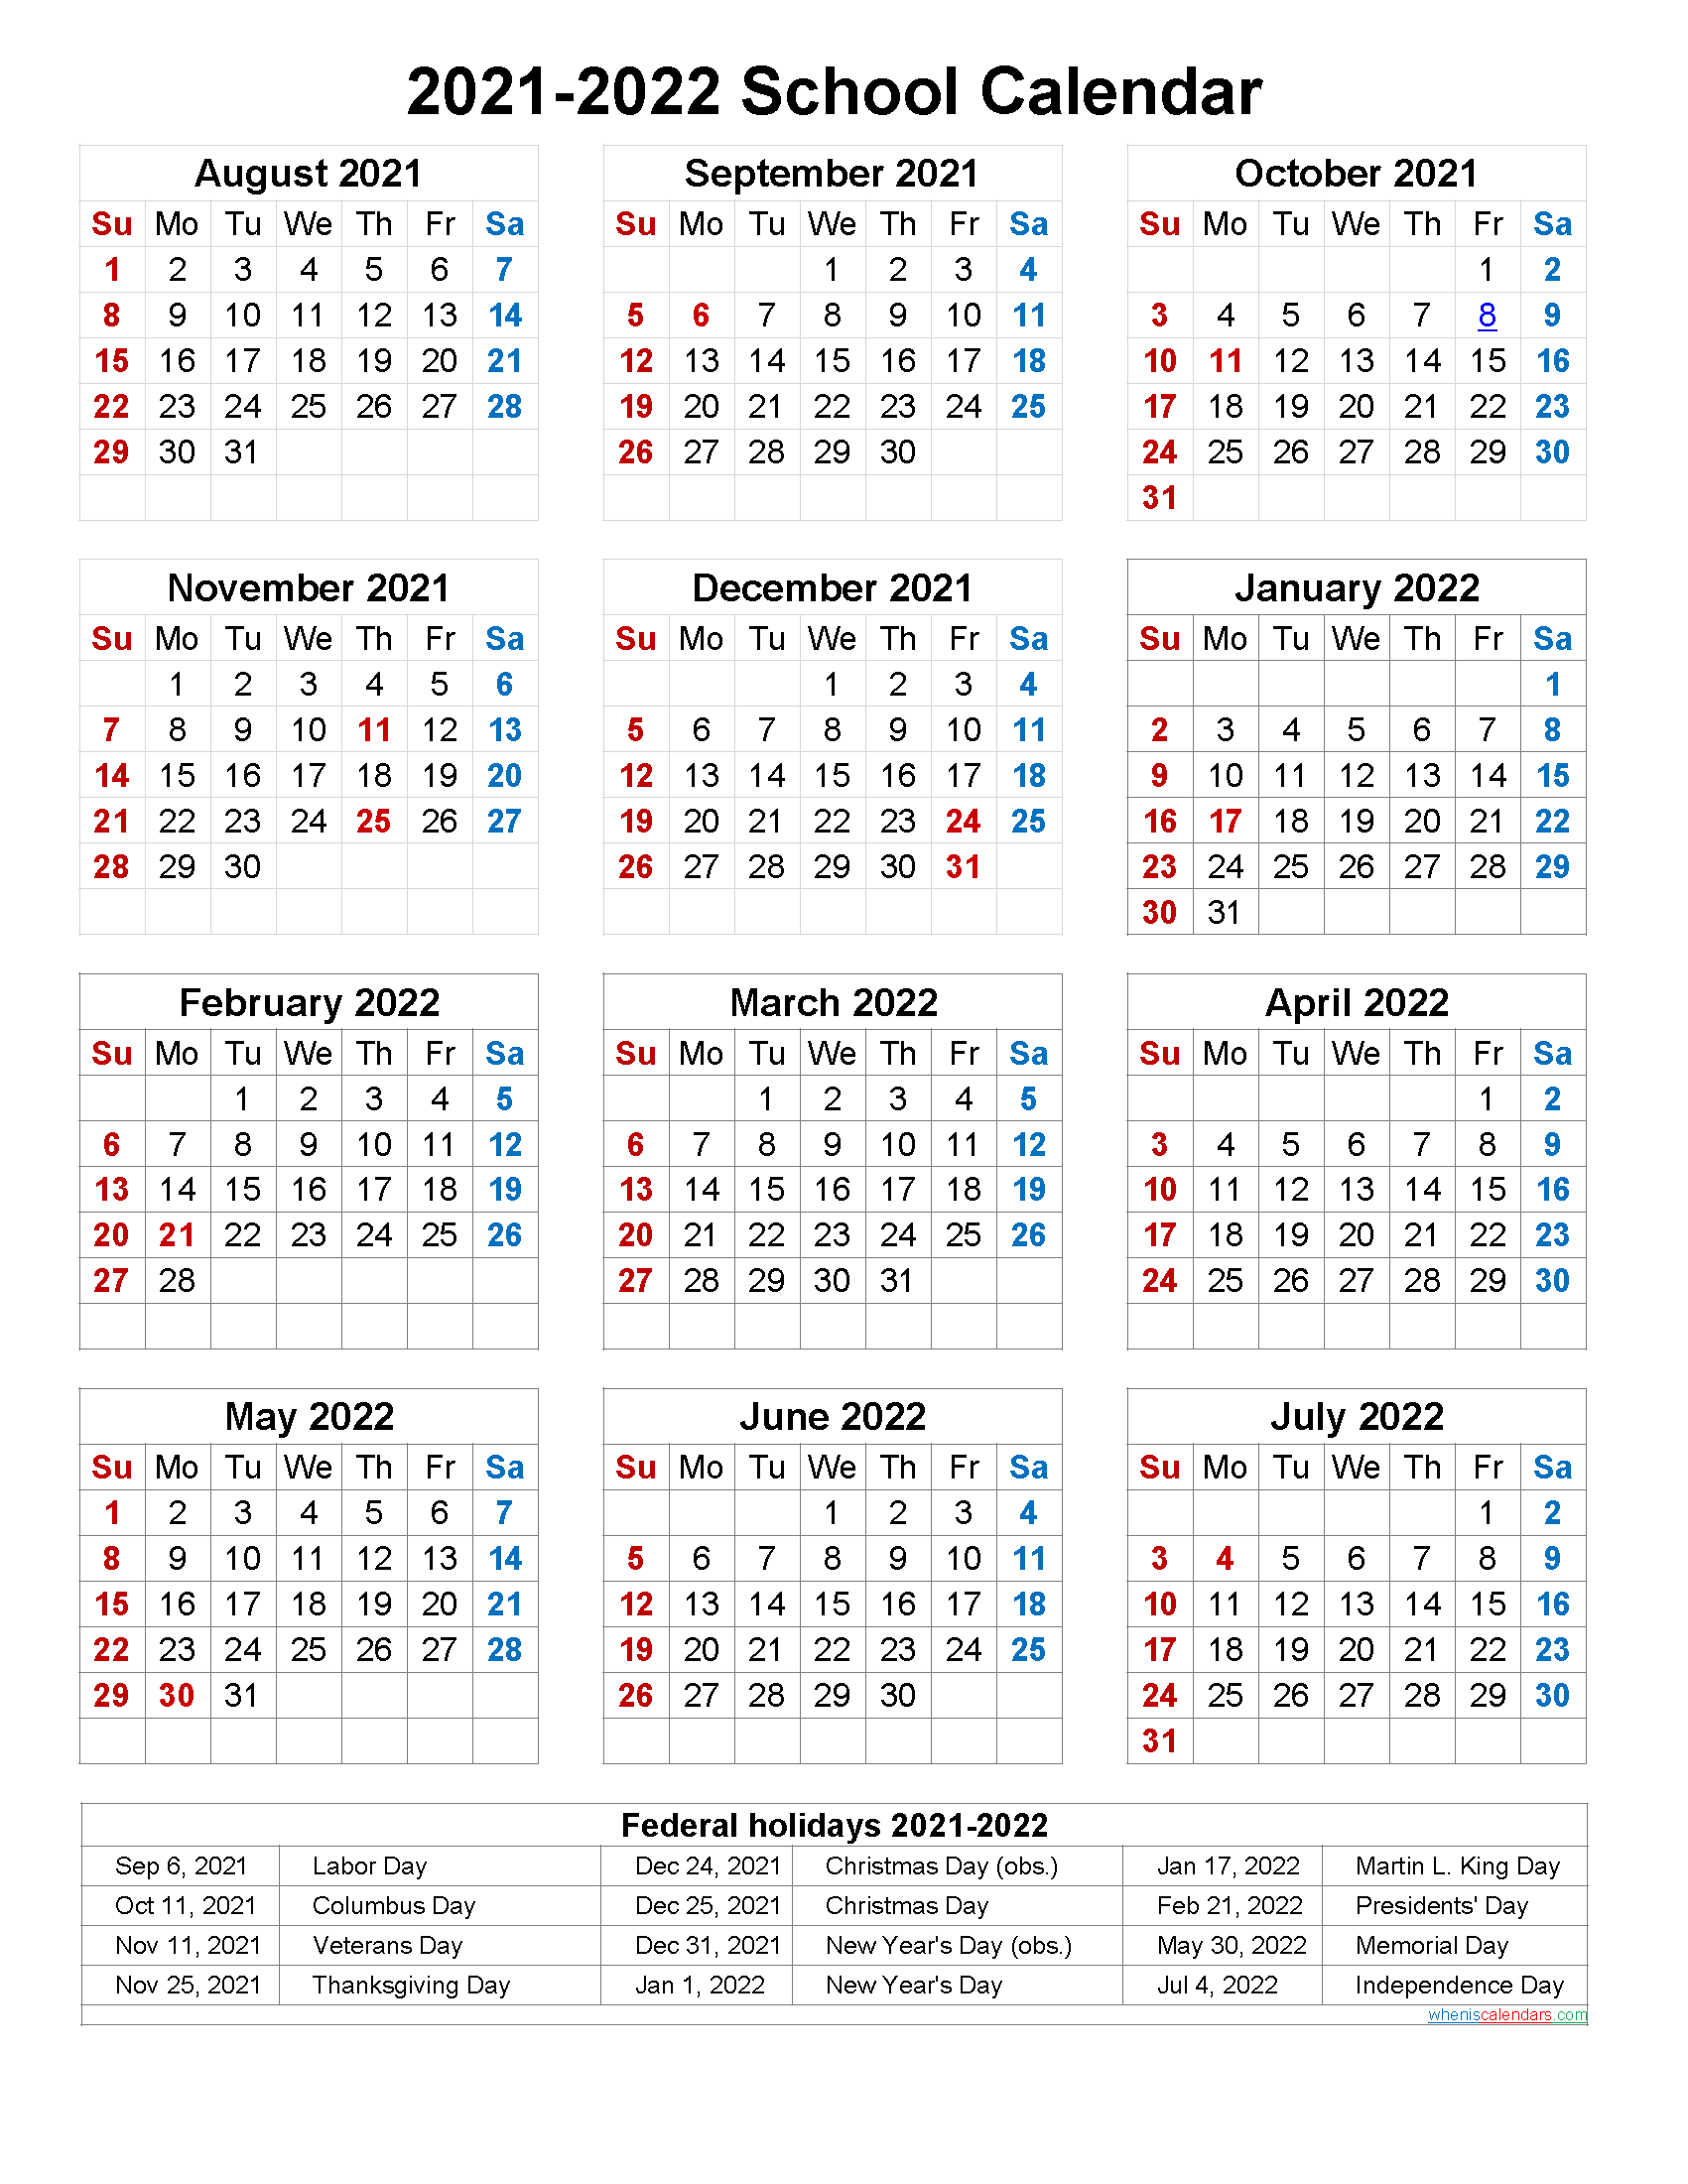 School Calendar 2021 and 2022 Printable